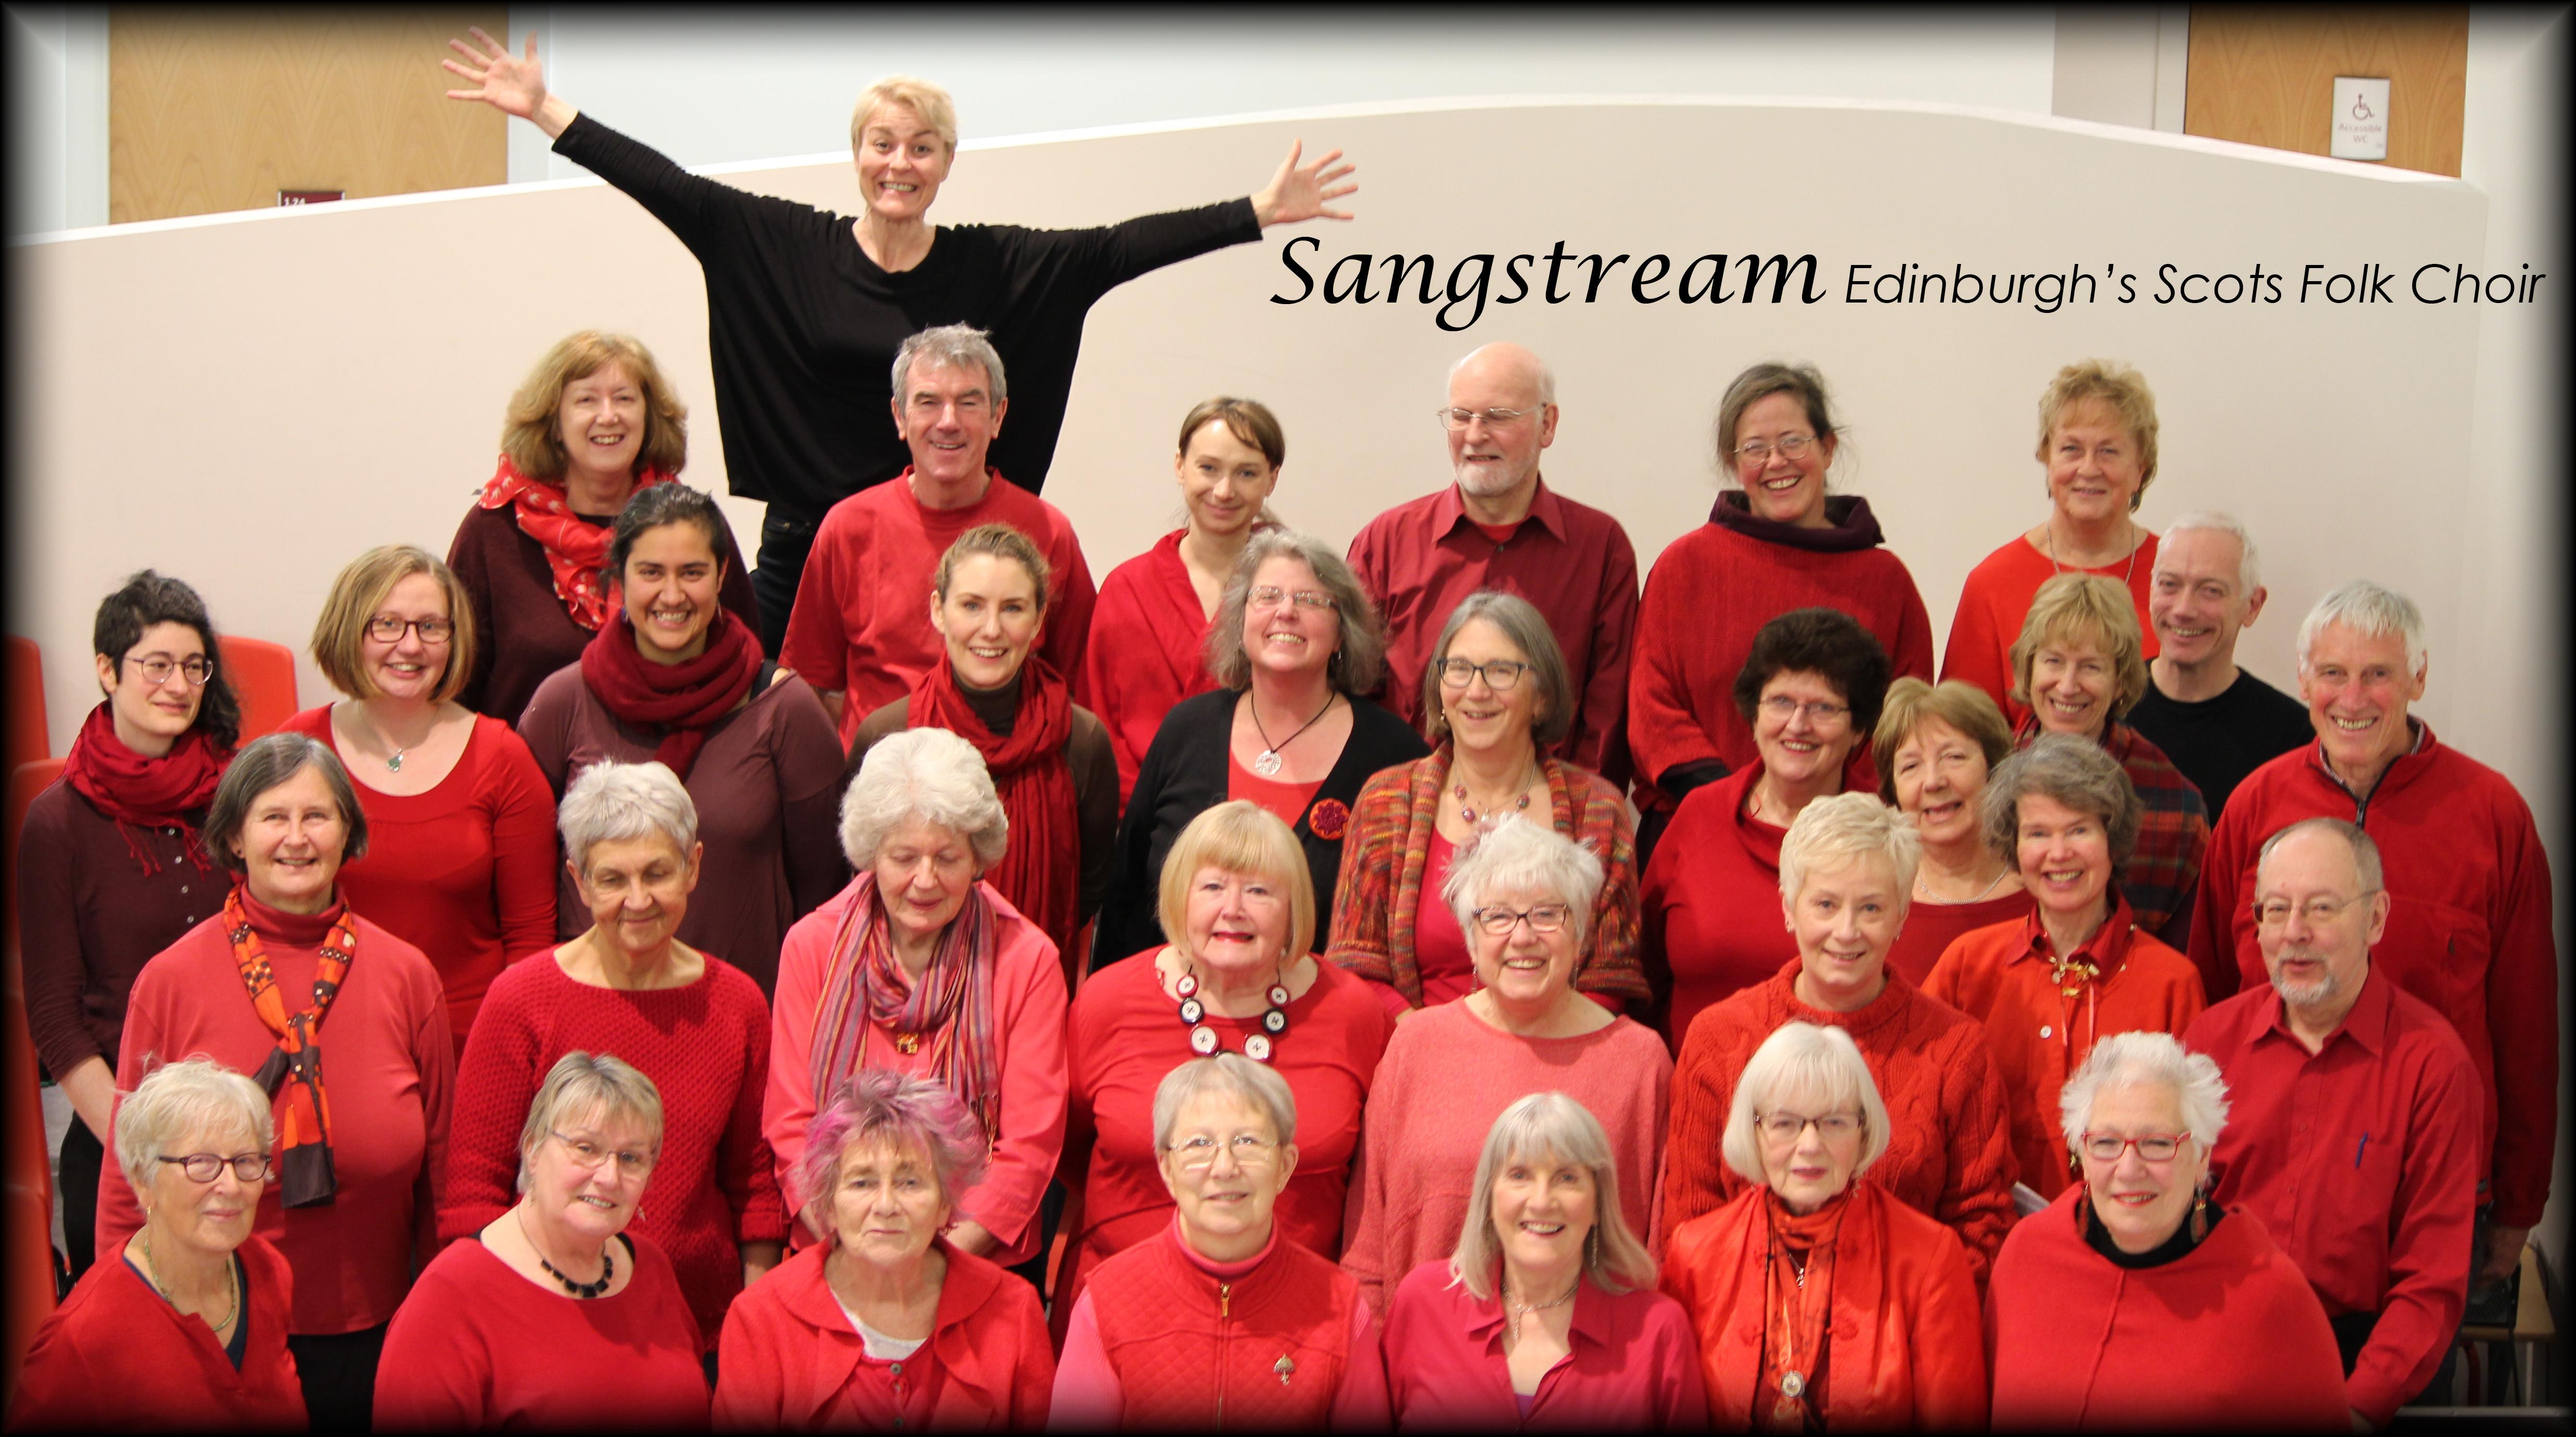 Sangstream